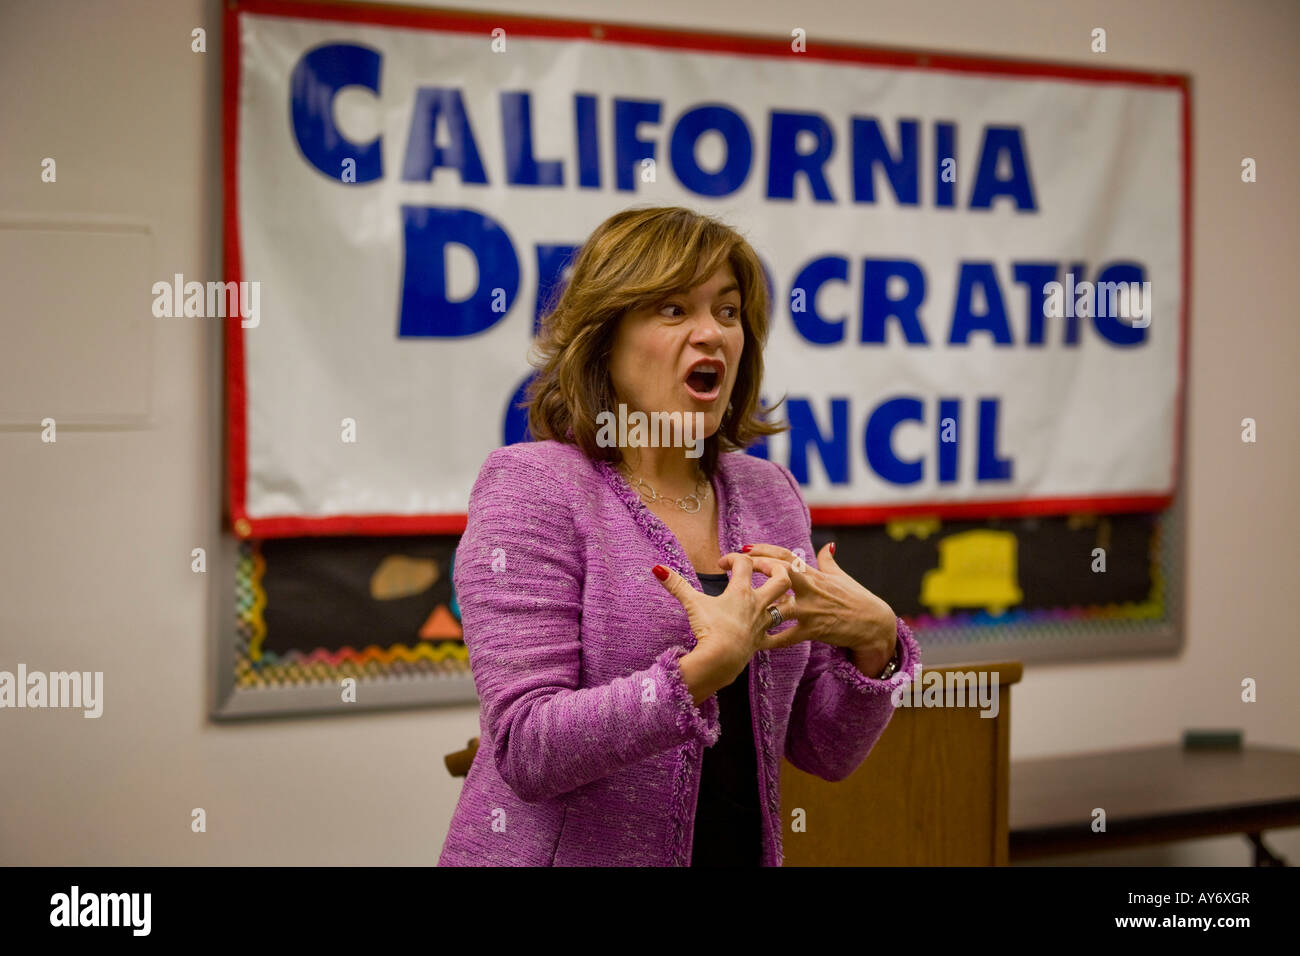 Democrat US Congresswoman Loretta Sanchez speaks at a California political meeting Note banner in background - Stock Image